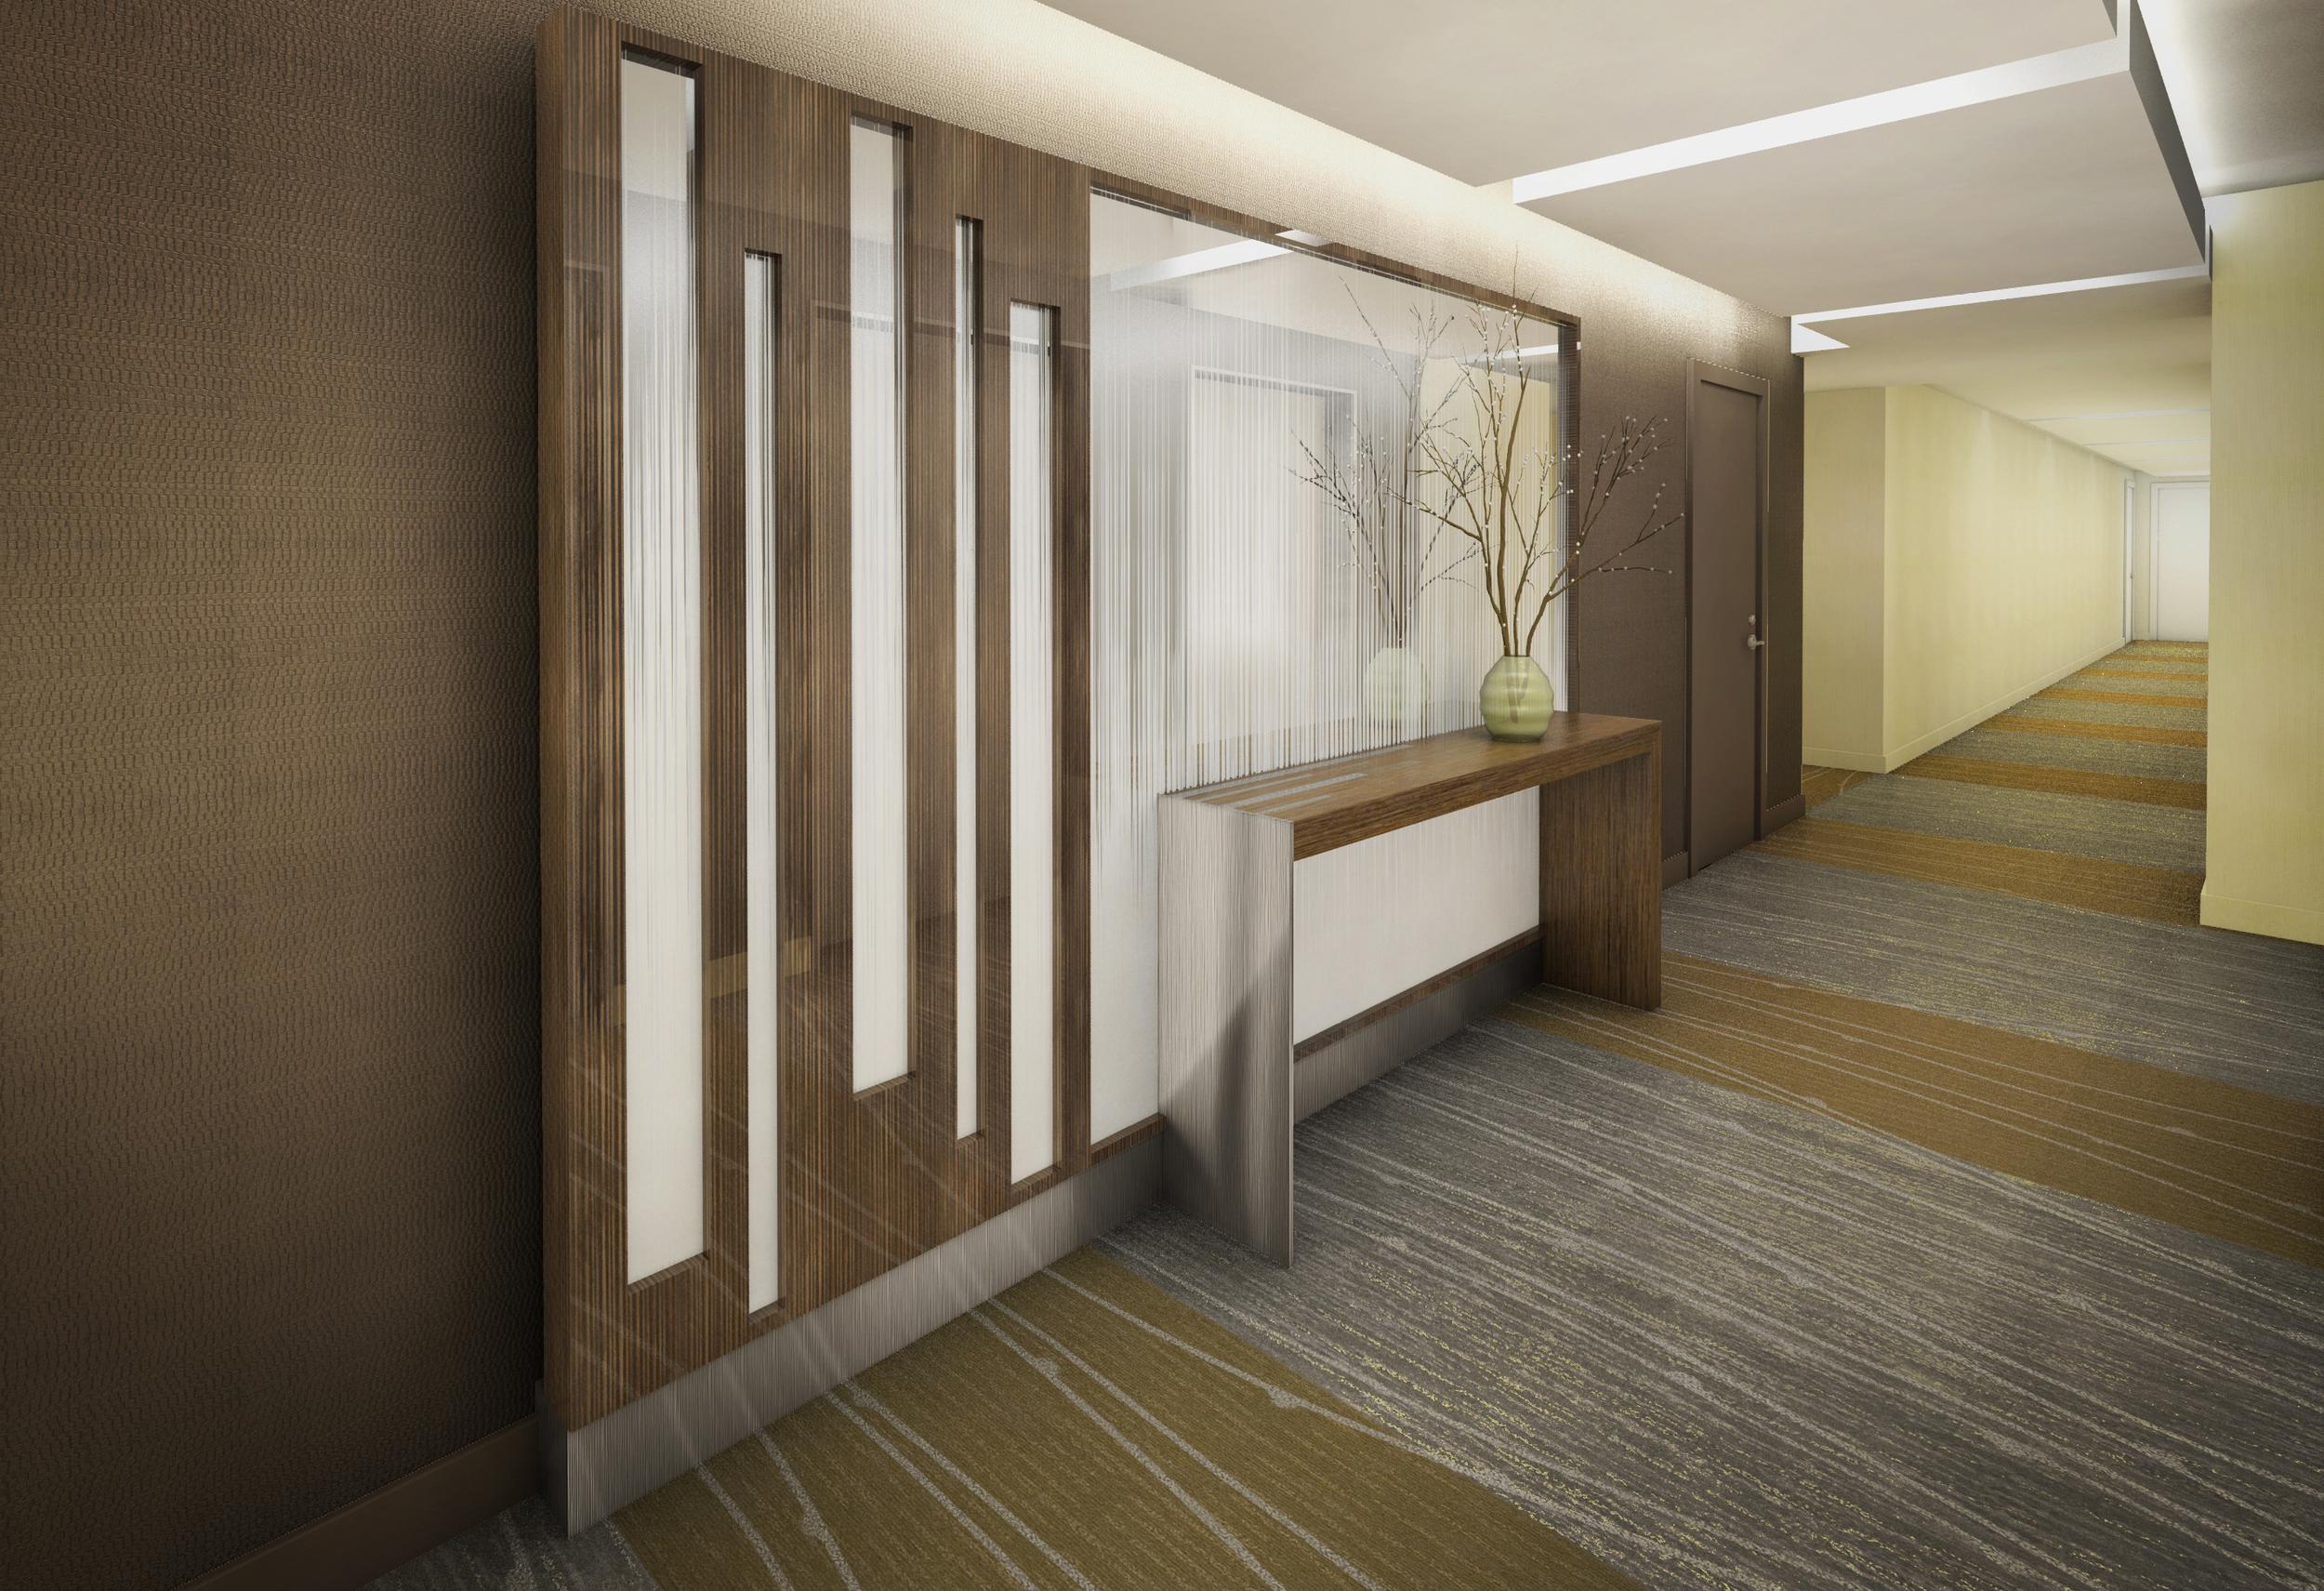 Residential Design Concept — Design - Interior Design Firm ...